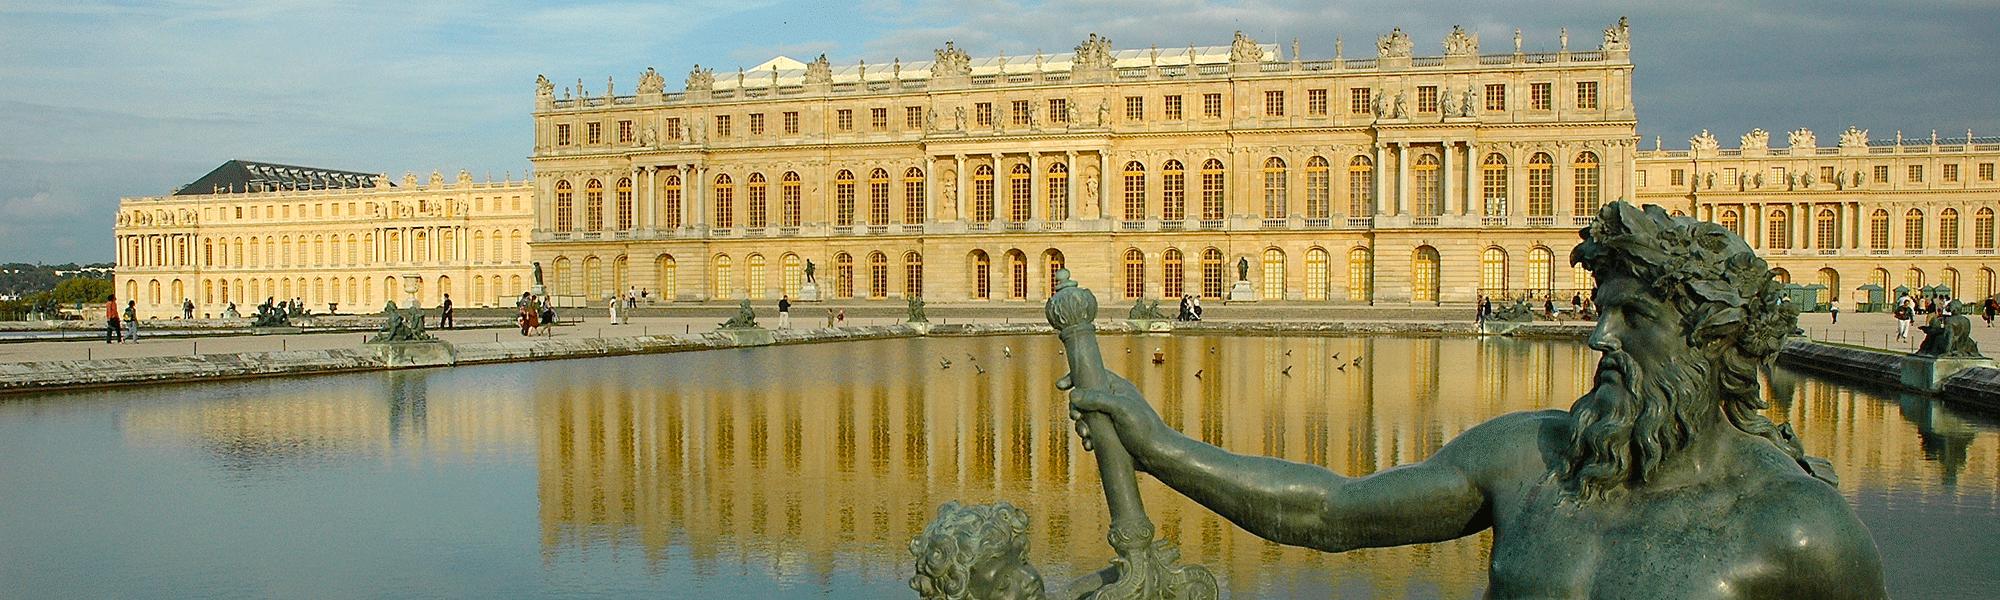 chateau_versailles_bassins_jardins_statues